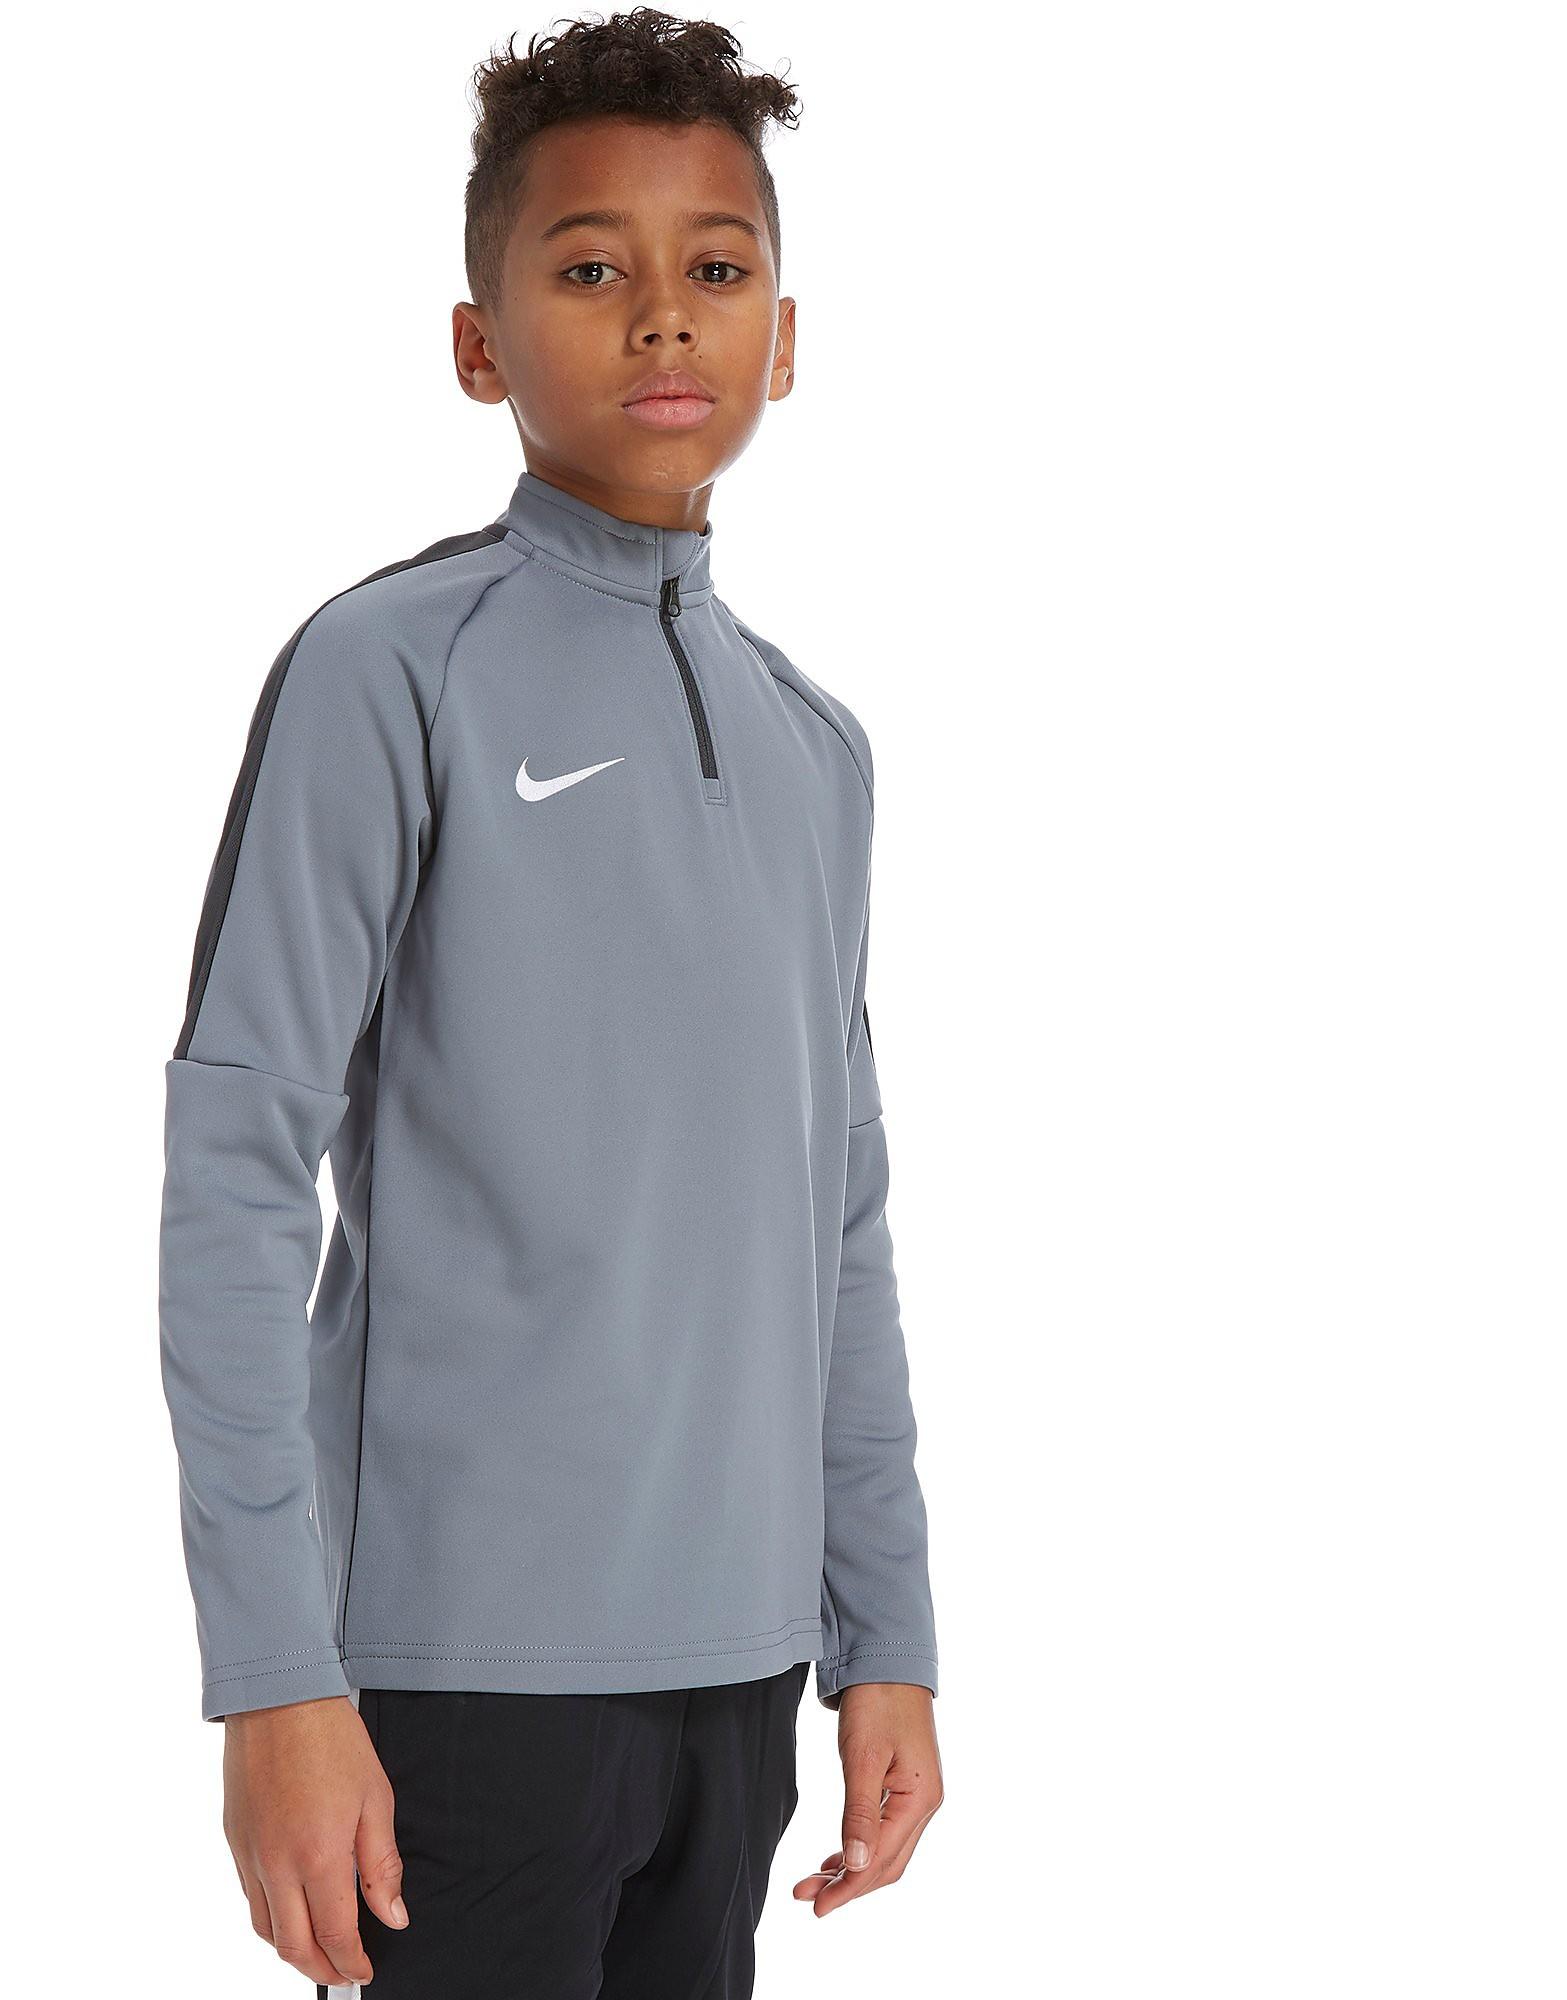 Nike camiseta Academy 1/4 Zip júnior